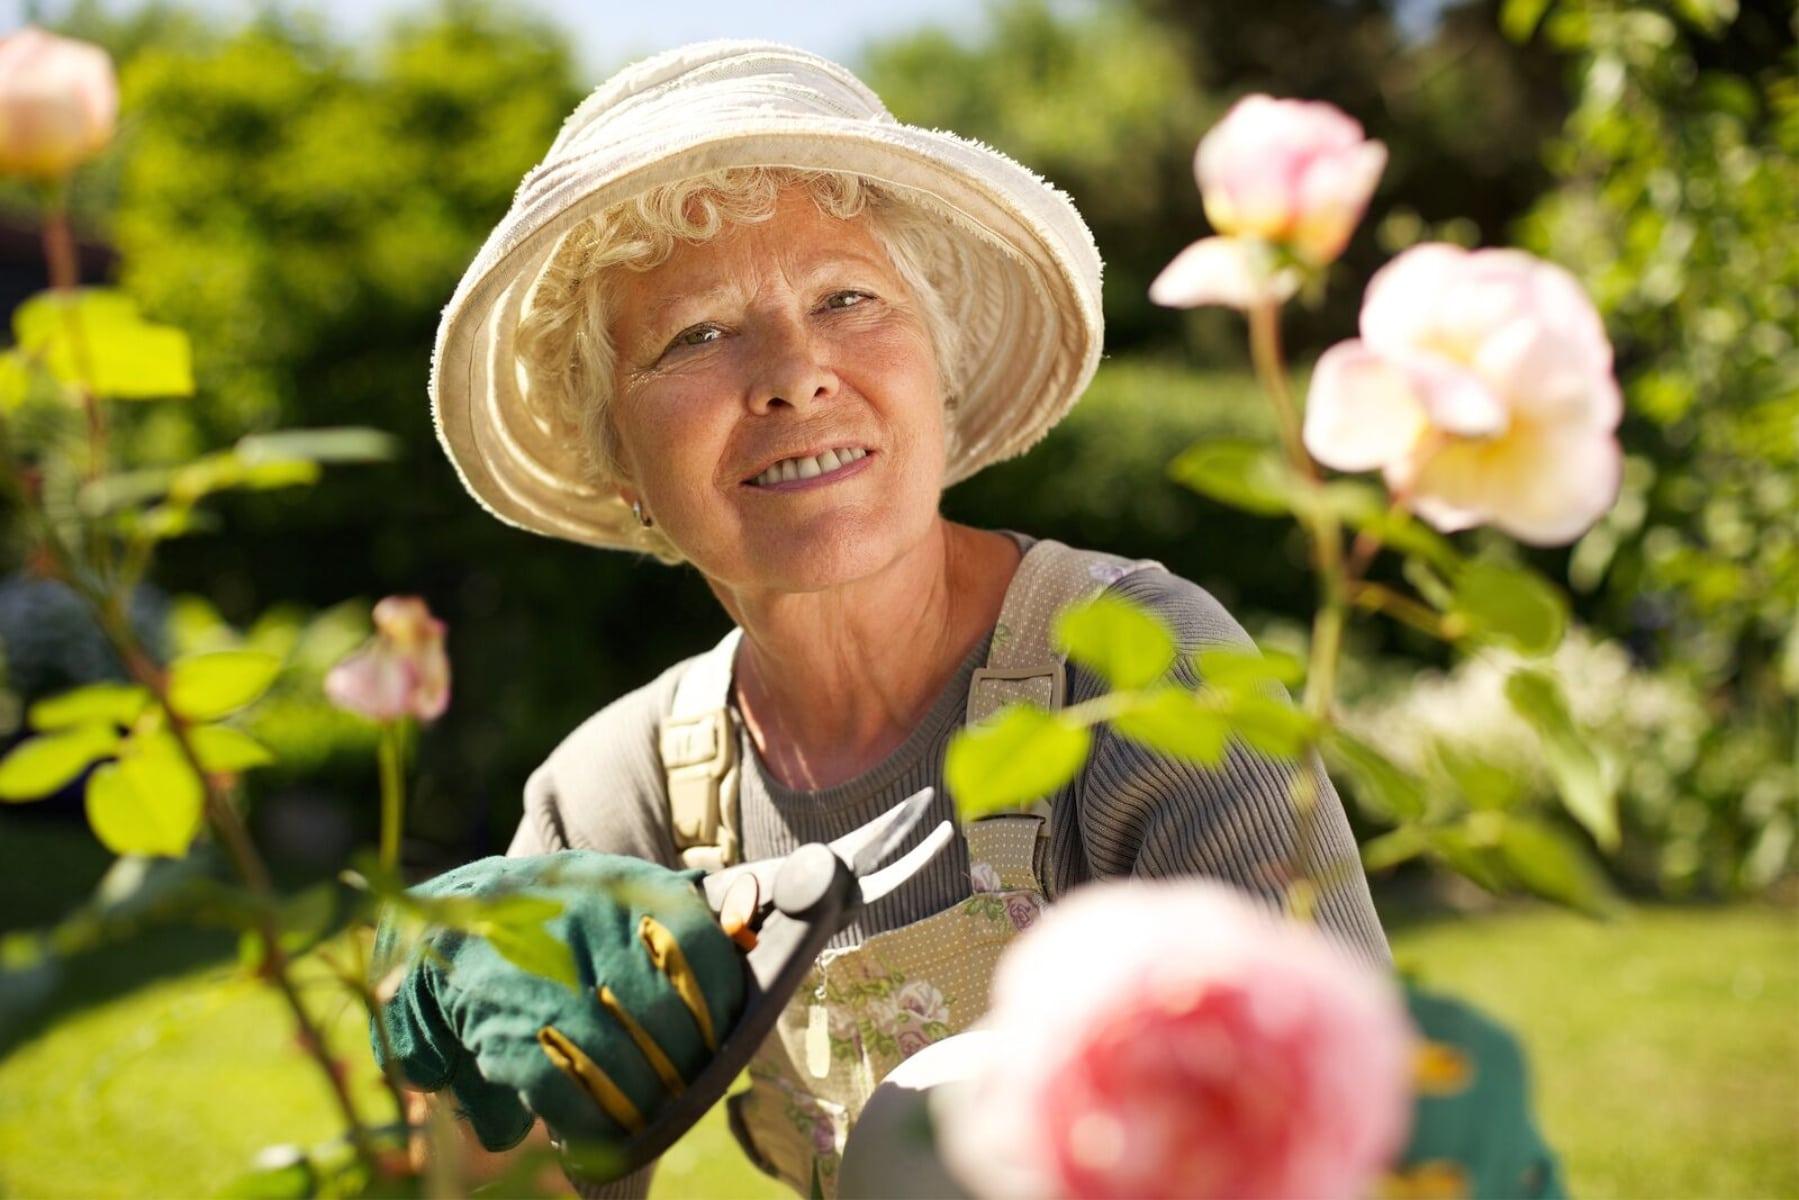 Home Health Care in Gainesville GA: Reducing Allergens